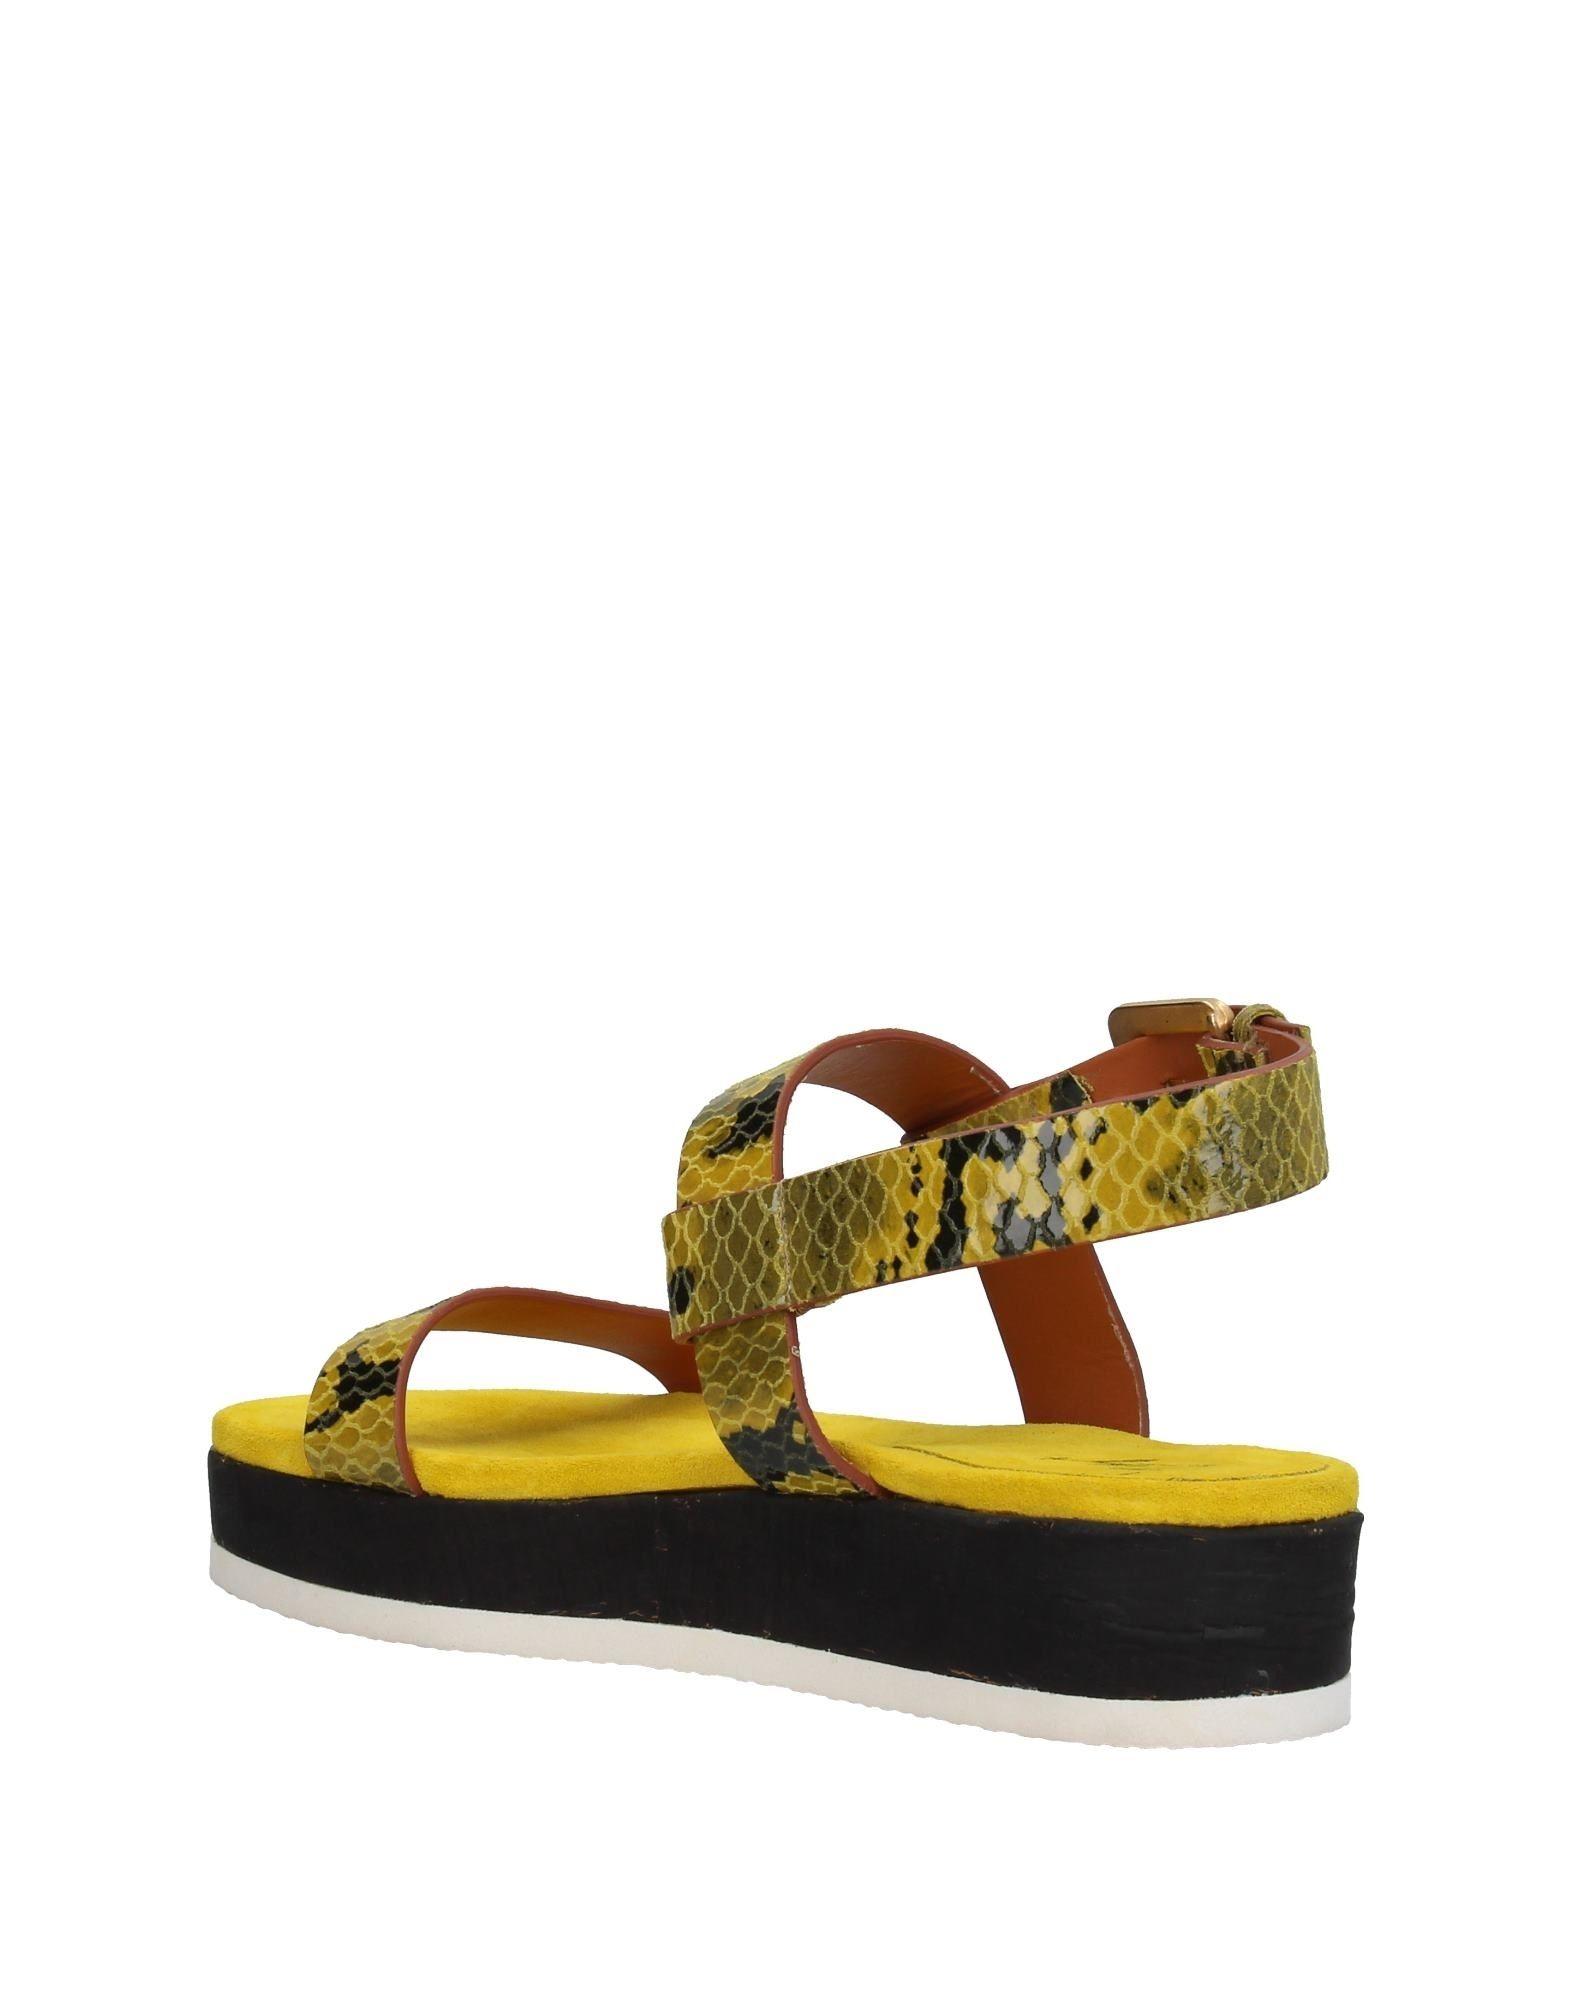 Chaussures - Sandales Zizi Florsheim hxzM9